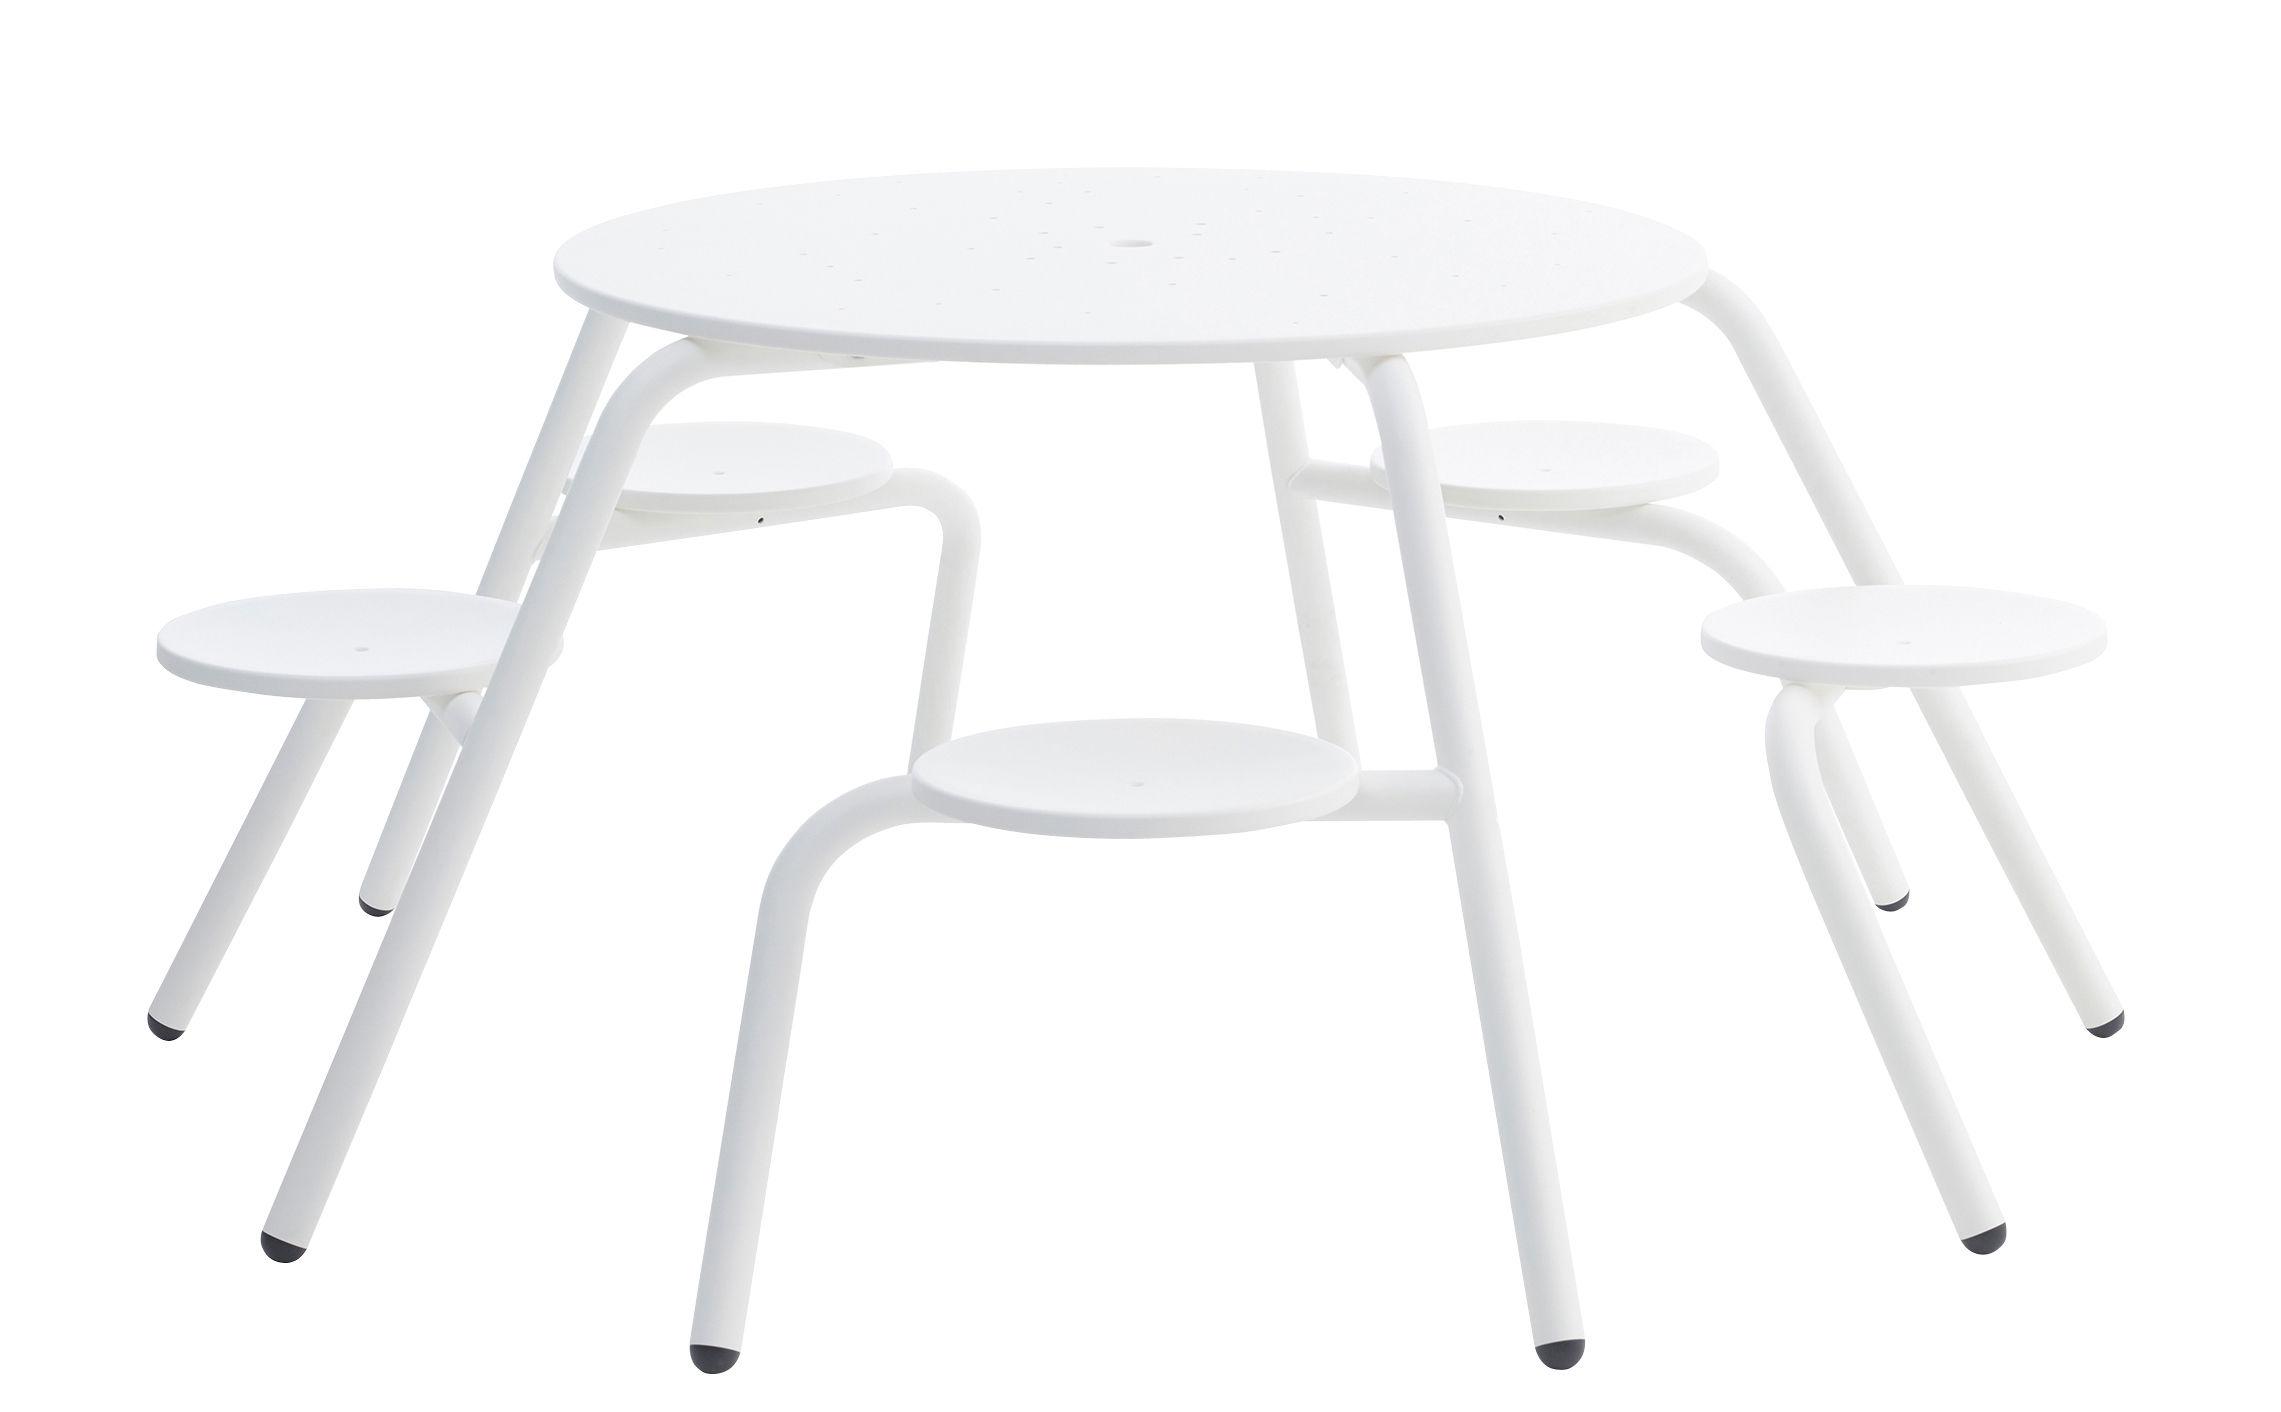 Table de jardin Virus / 5 places - Métal Blanc - Extremis | Made In ...